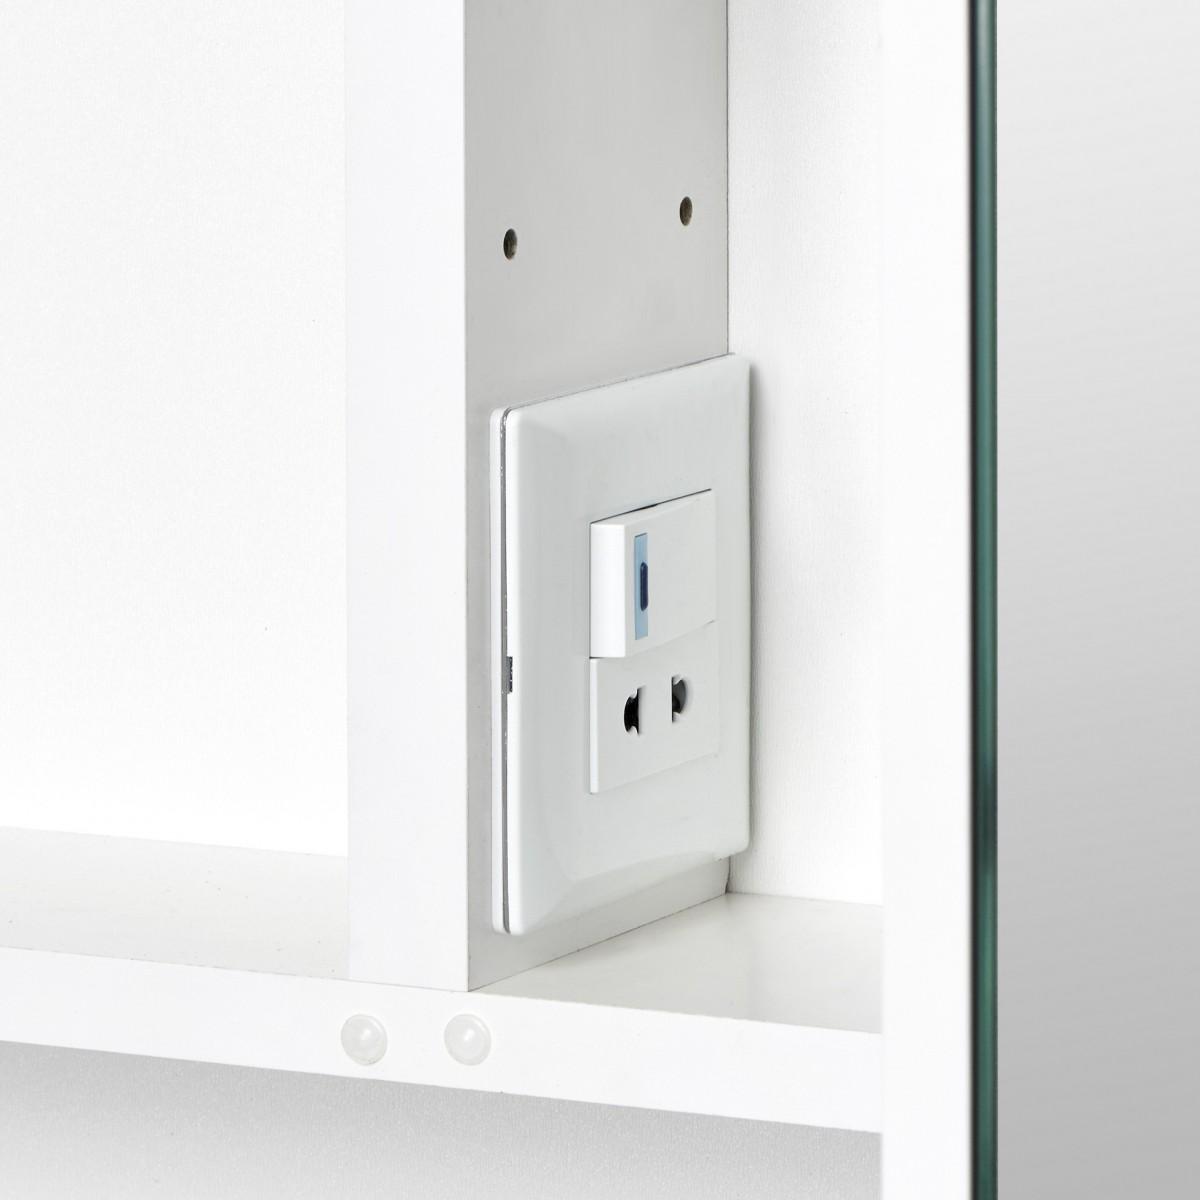 Зеркальный шкаф Акватон Инфинити 65 белый